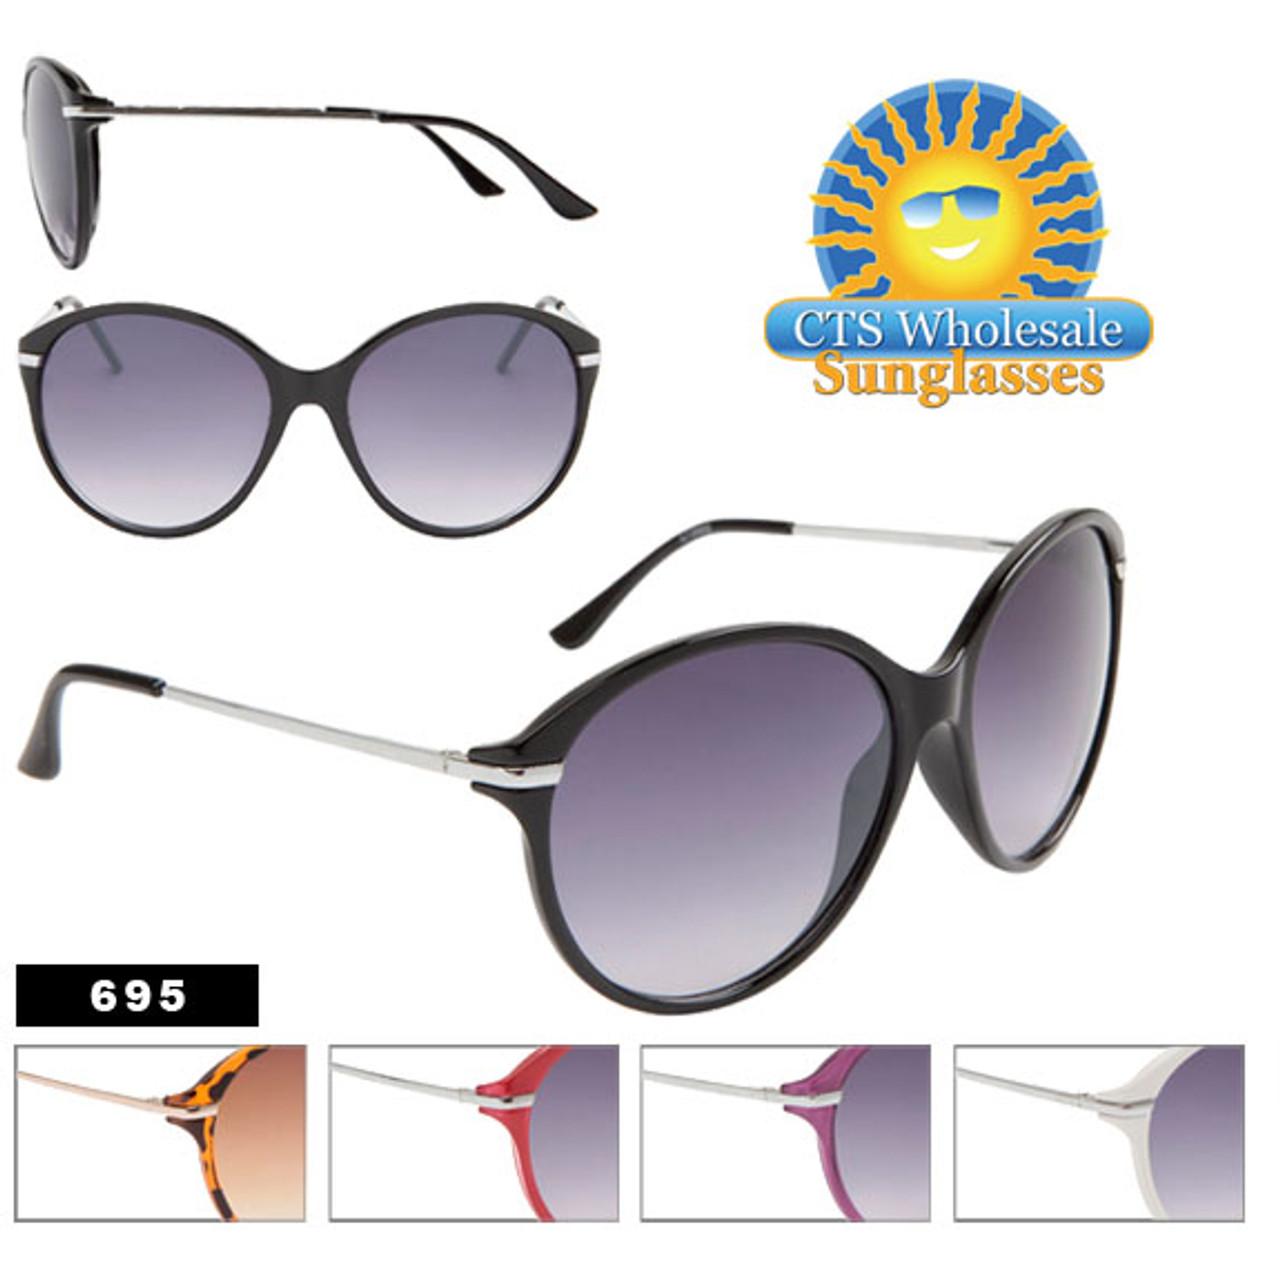 Classic Fashion Sunglasses 695